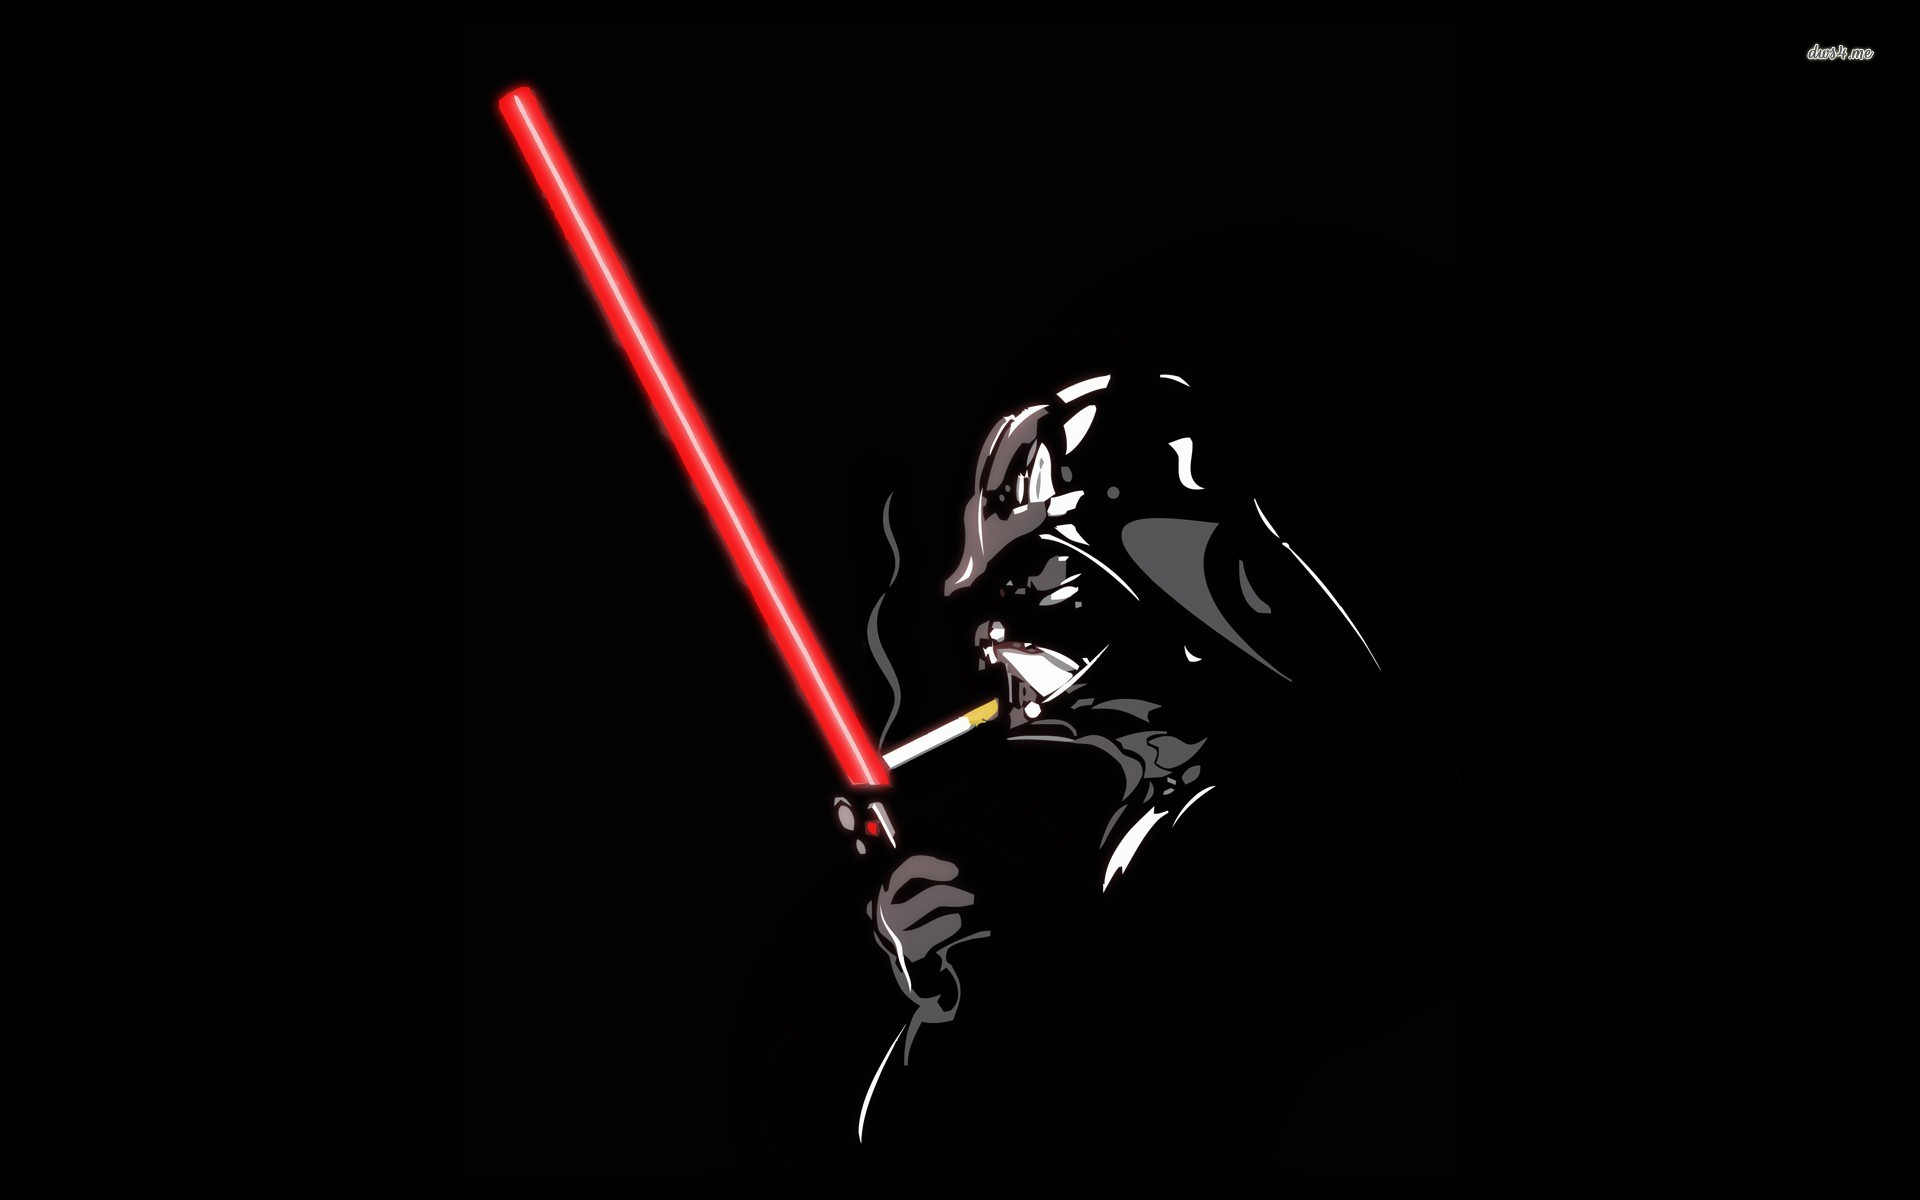 ... Darth Vader and his lightsaber wallpaper 1920x1200 ...